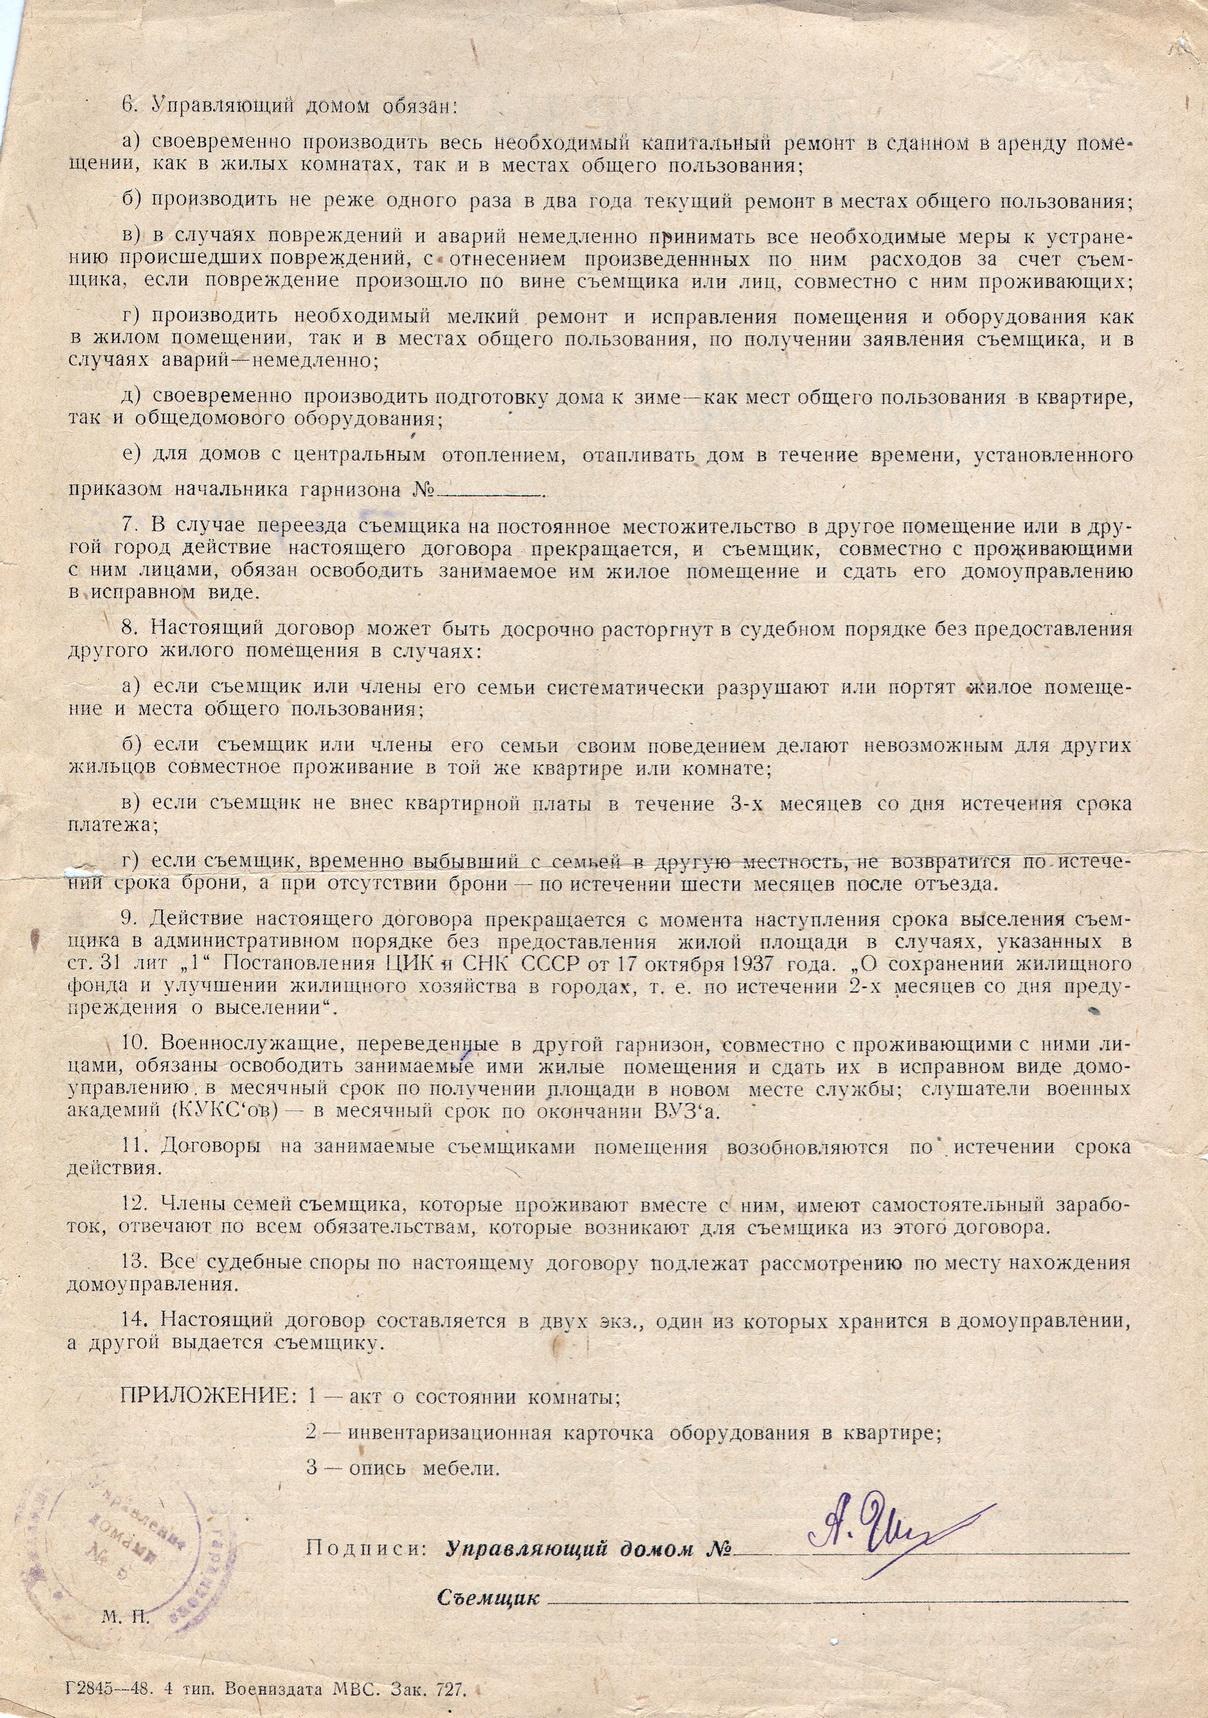 Dogovor-nayma-1949_2_resize